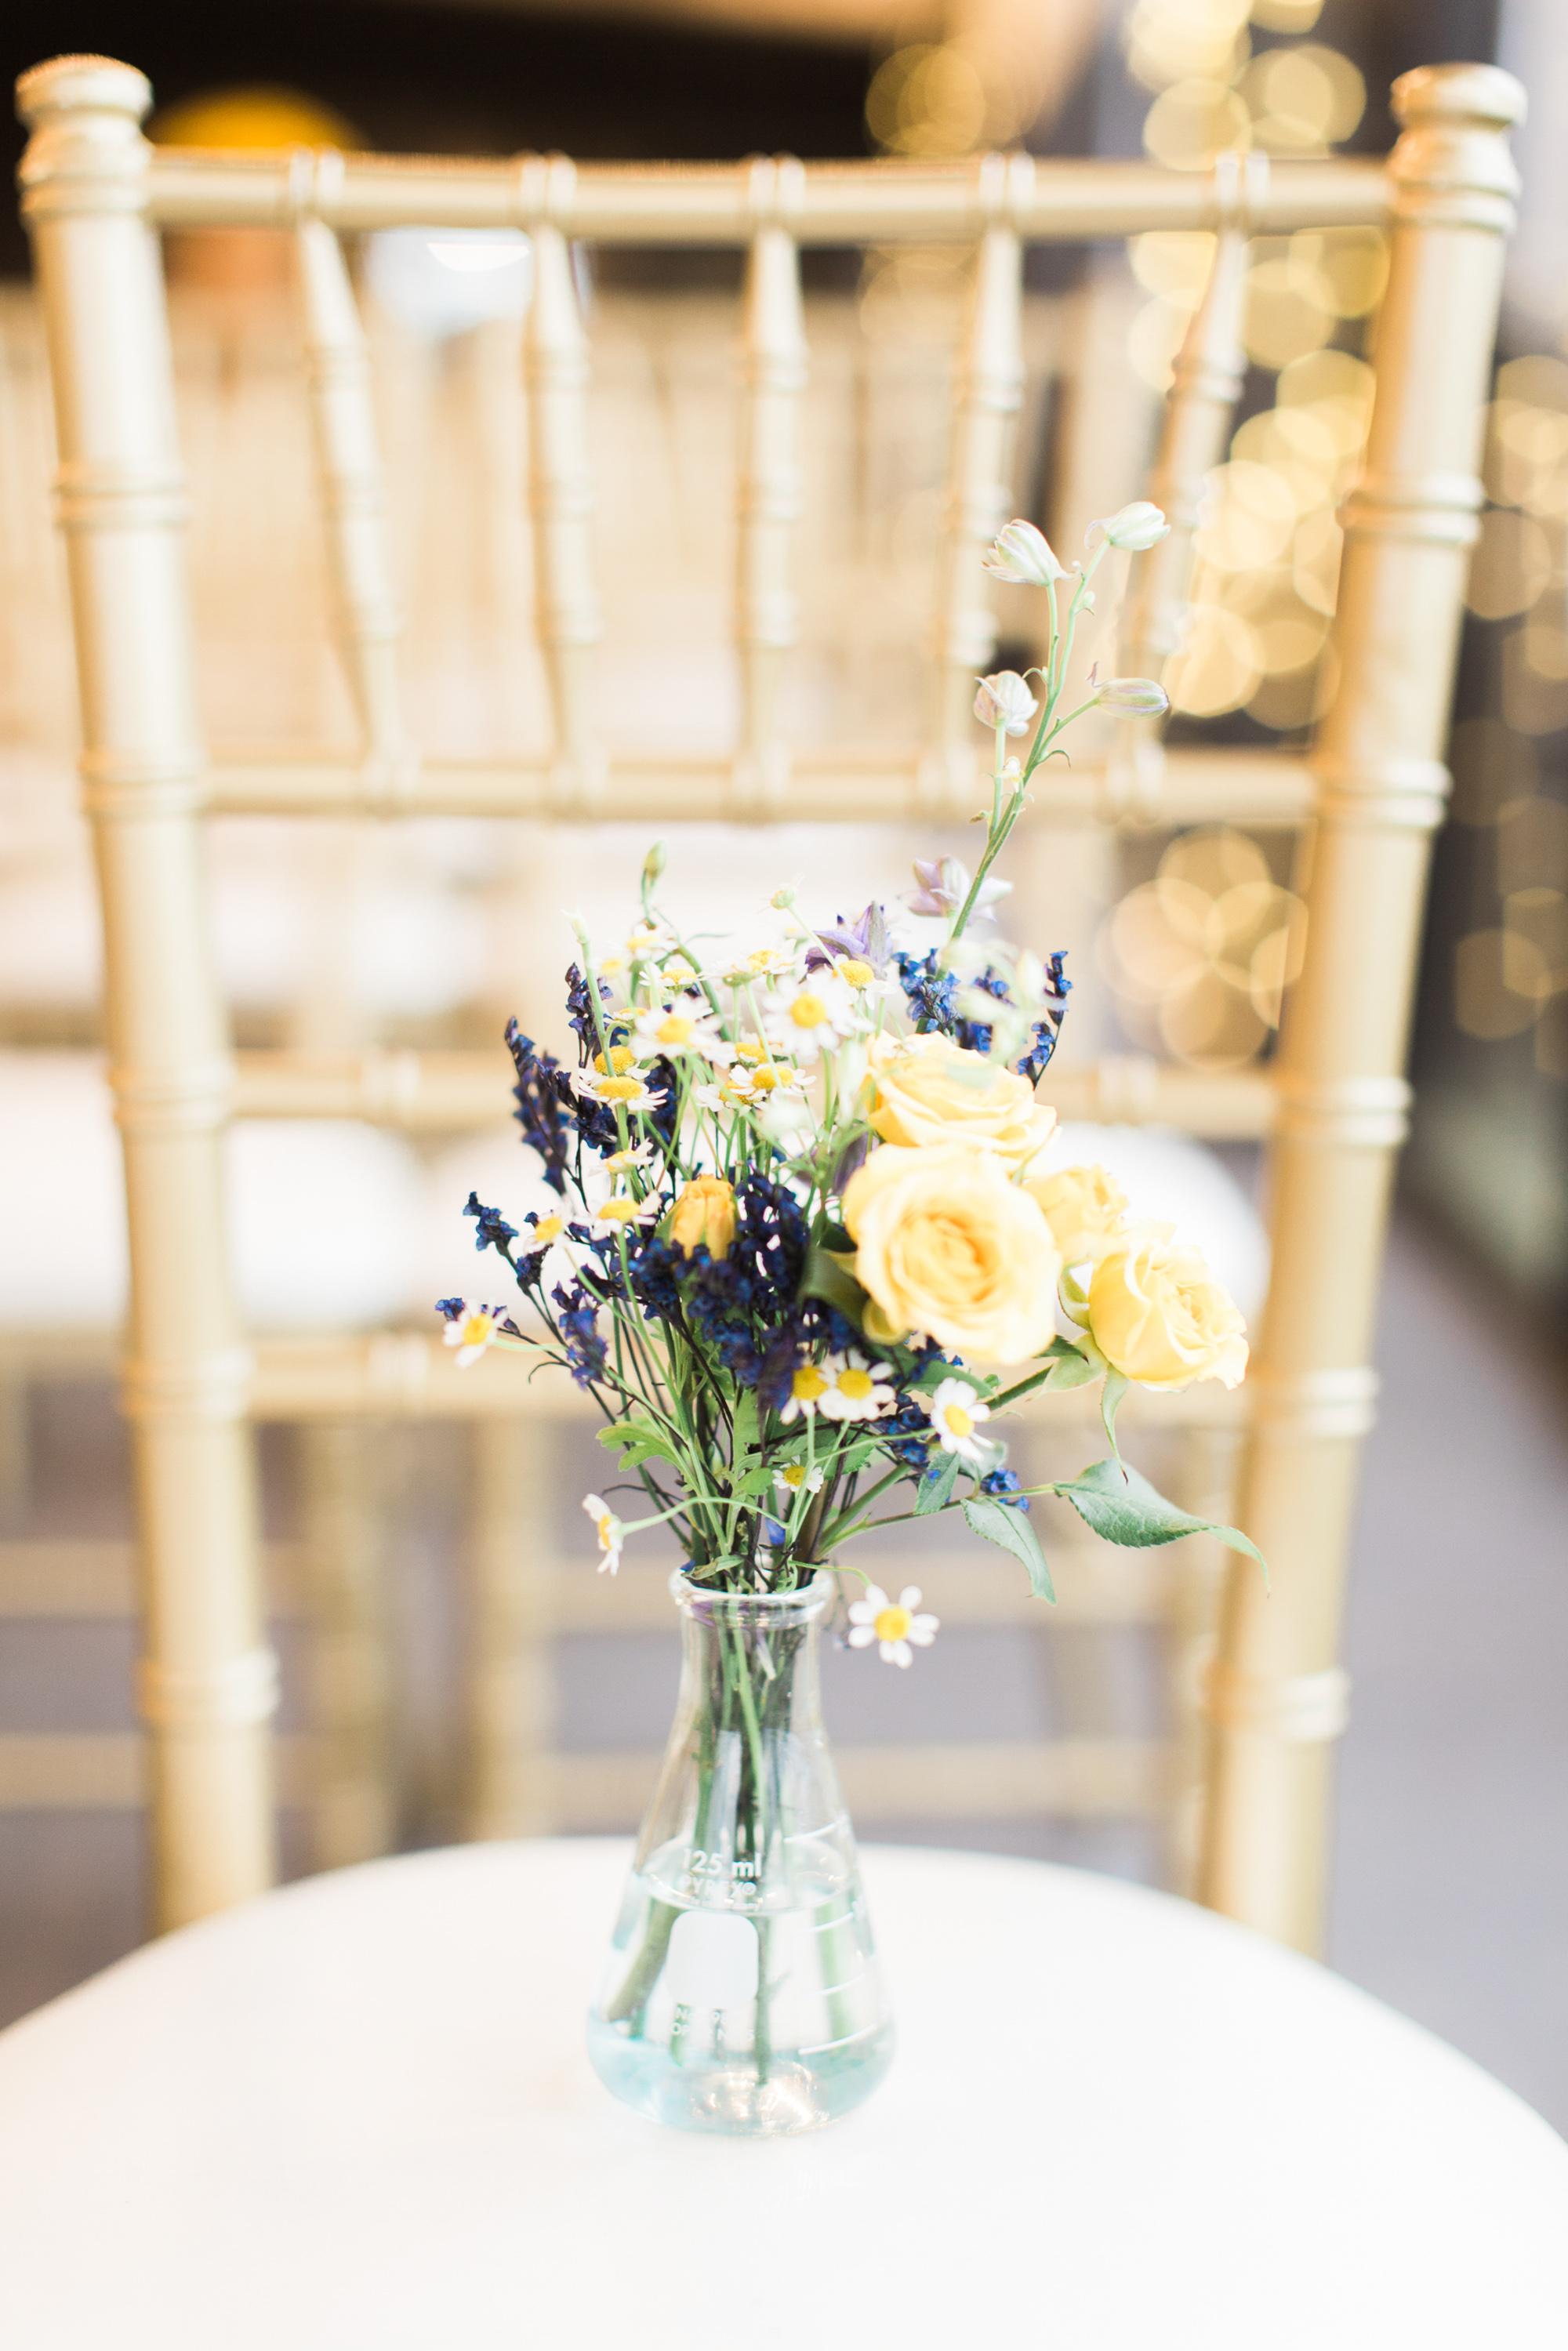 b0edf-messina-hof-wedding-24messina-hof-wedding-24.jpg